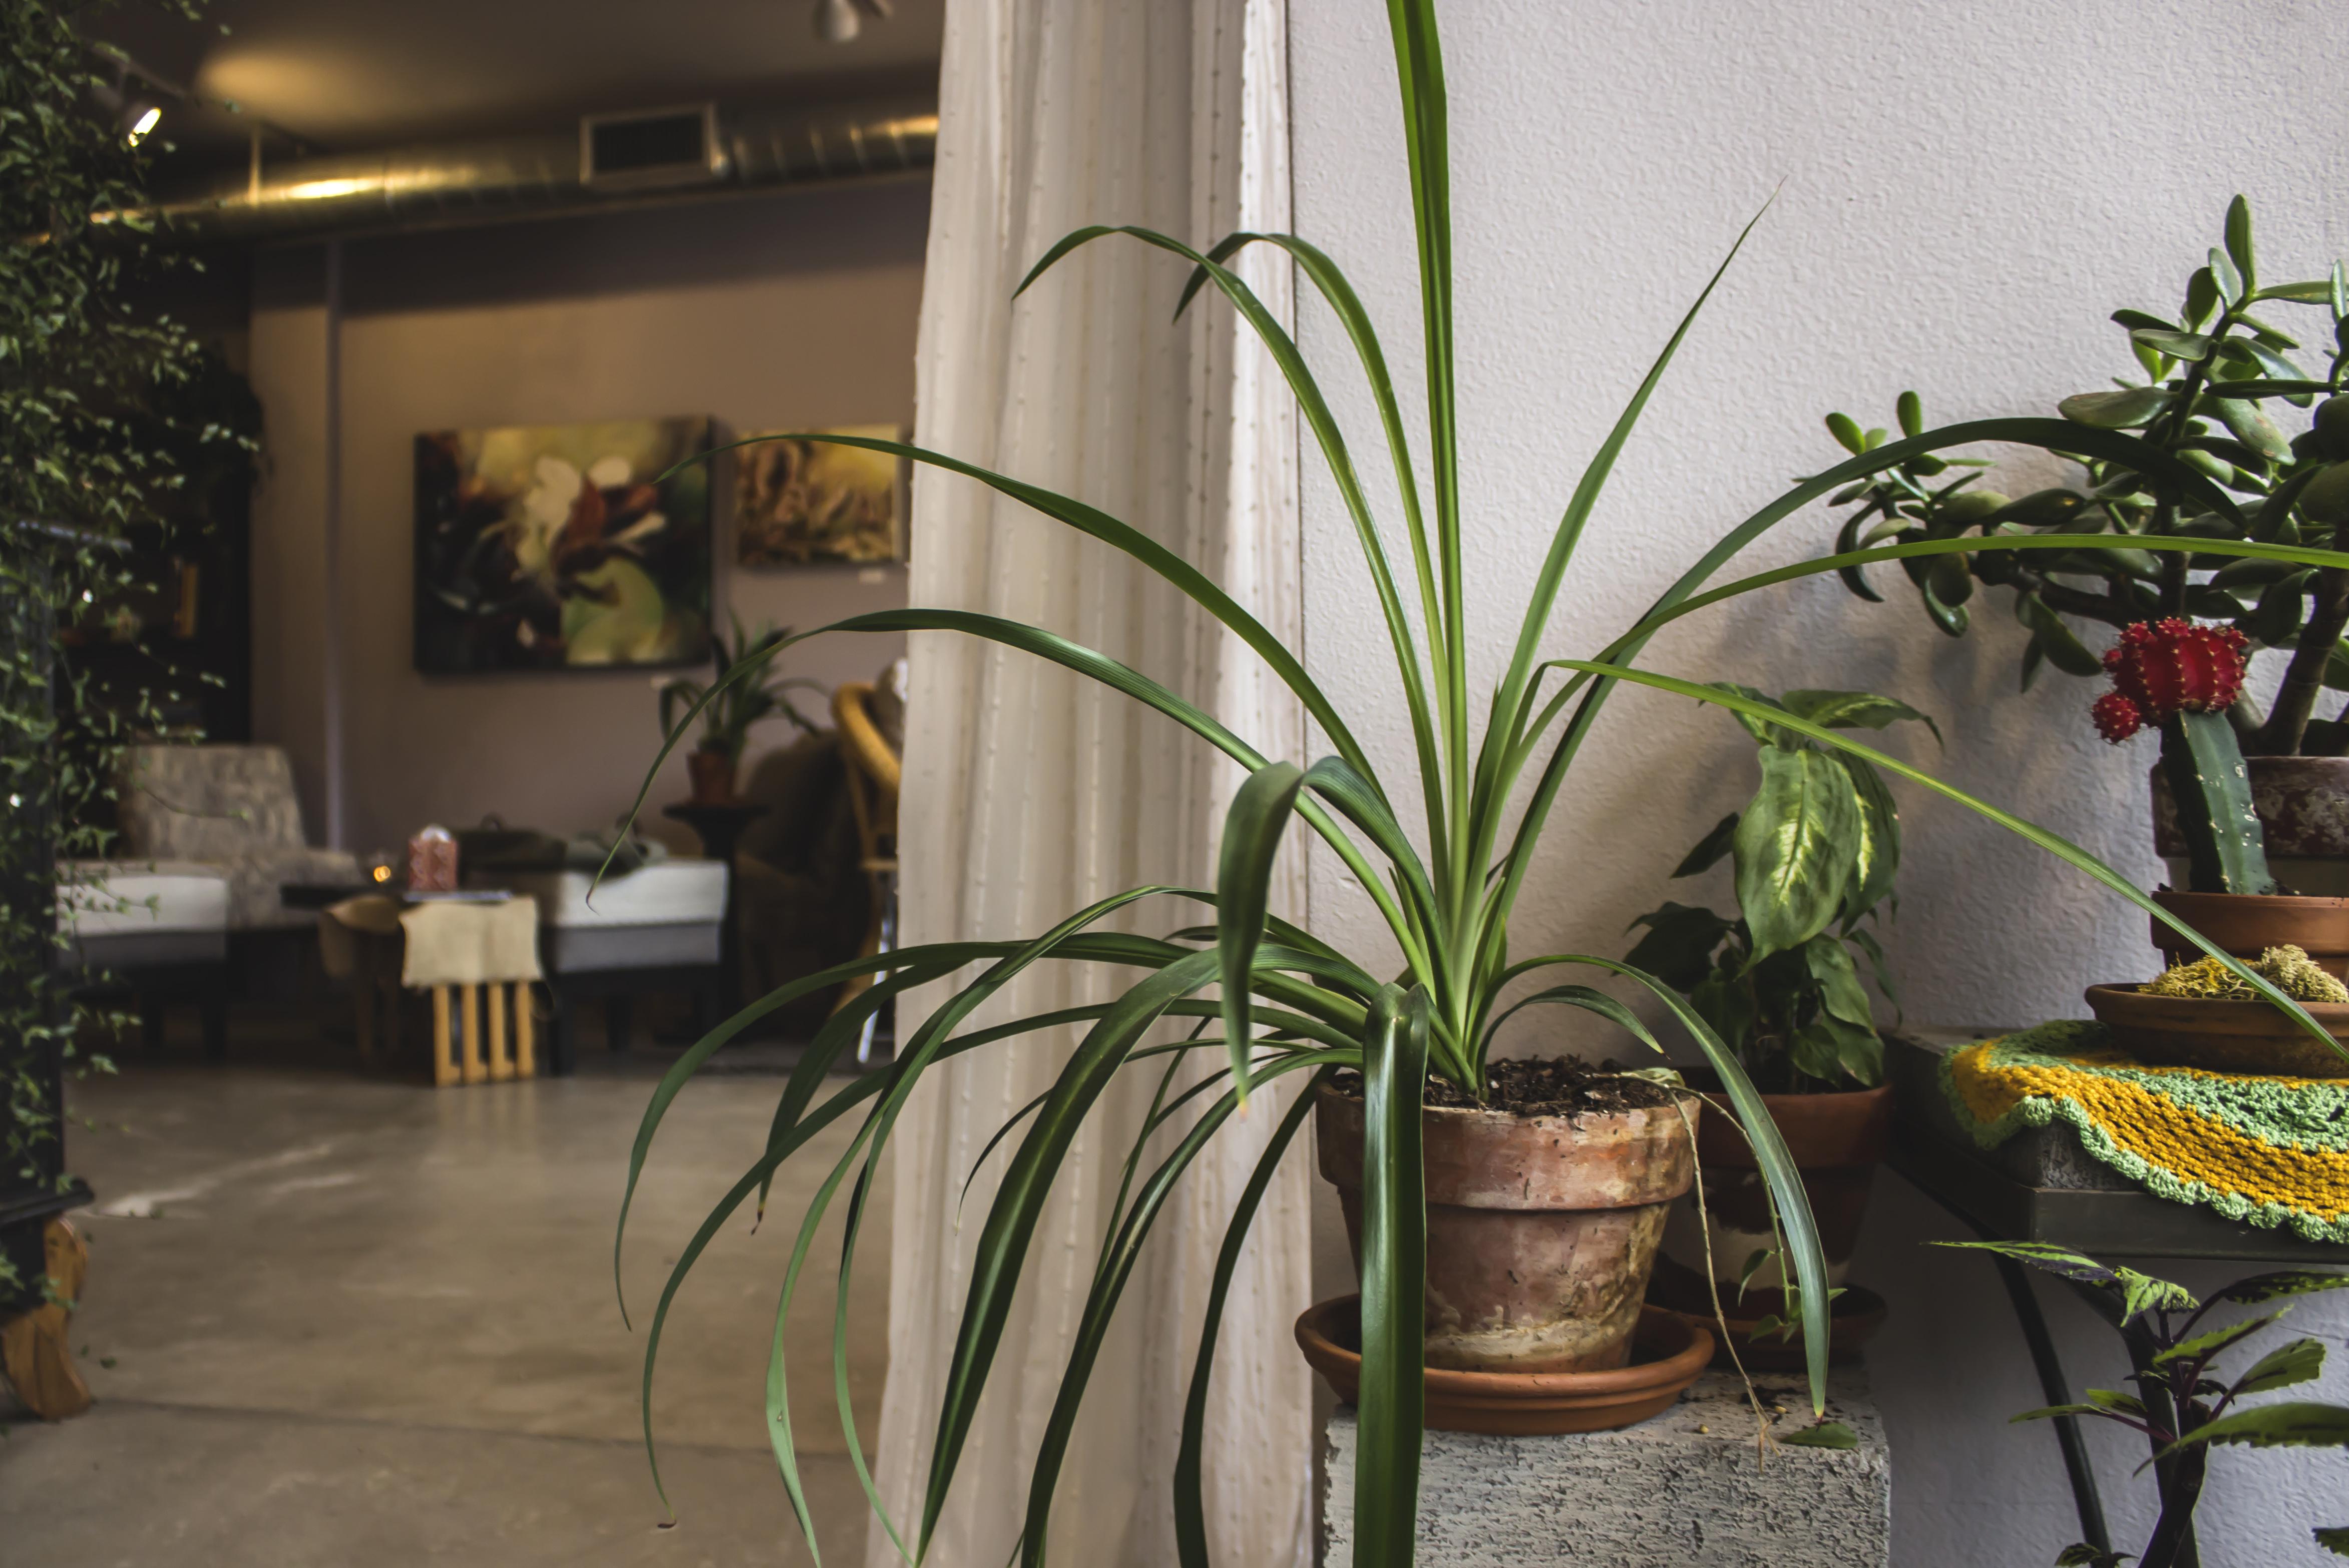 18 plants hallway.jpg